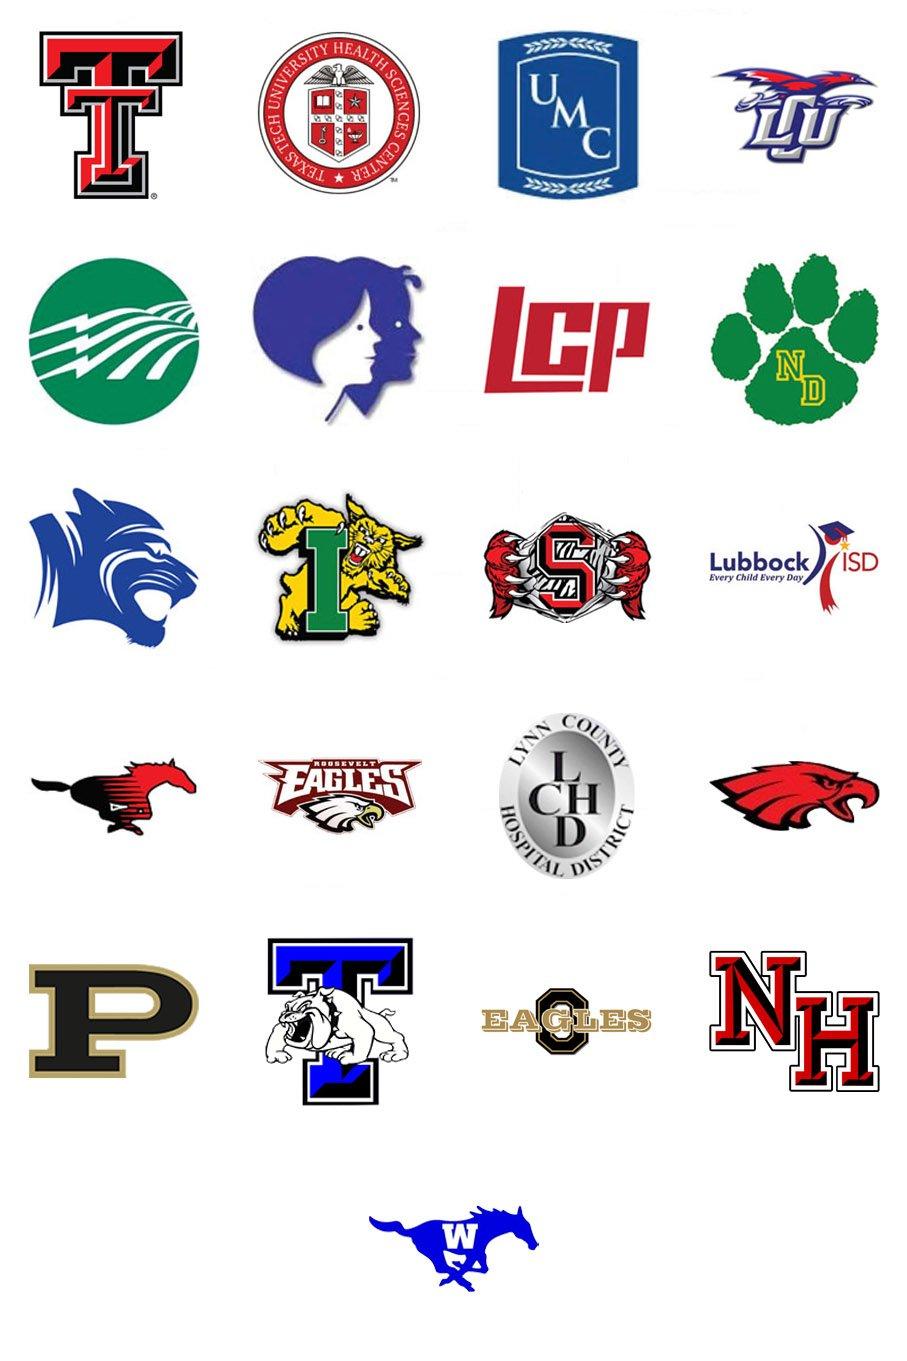 ttcu affiliation logos